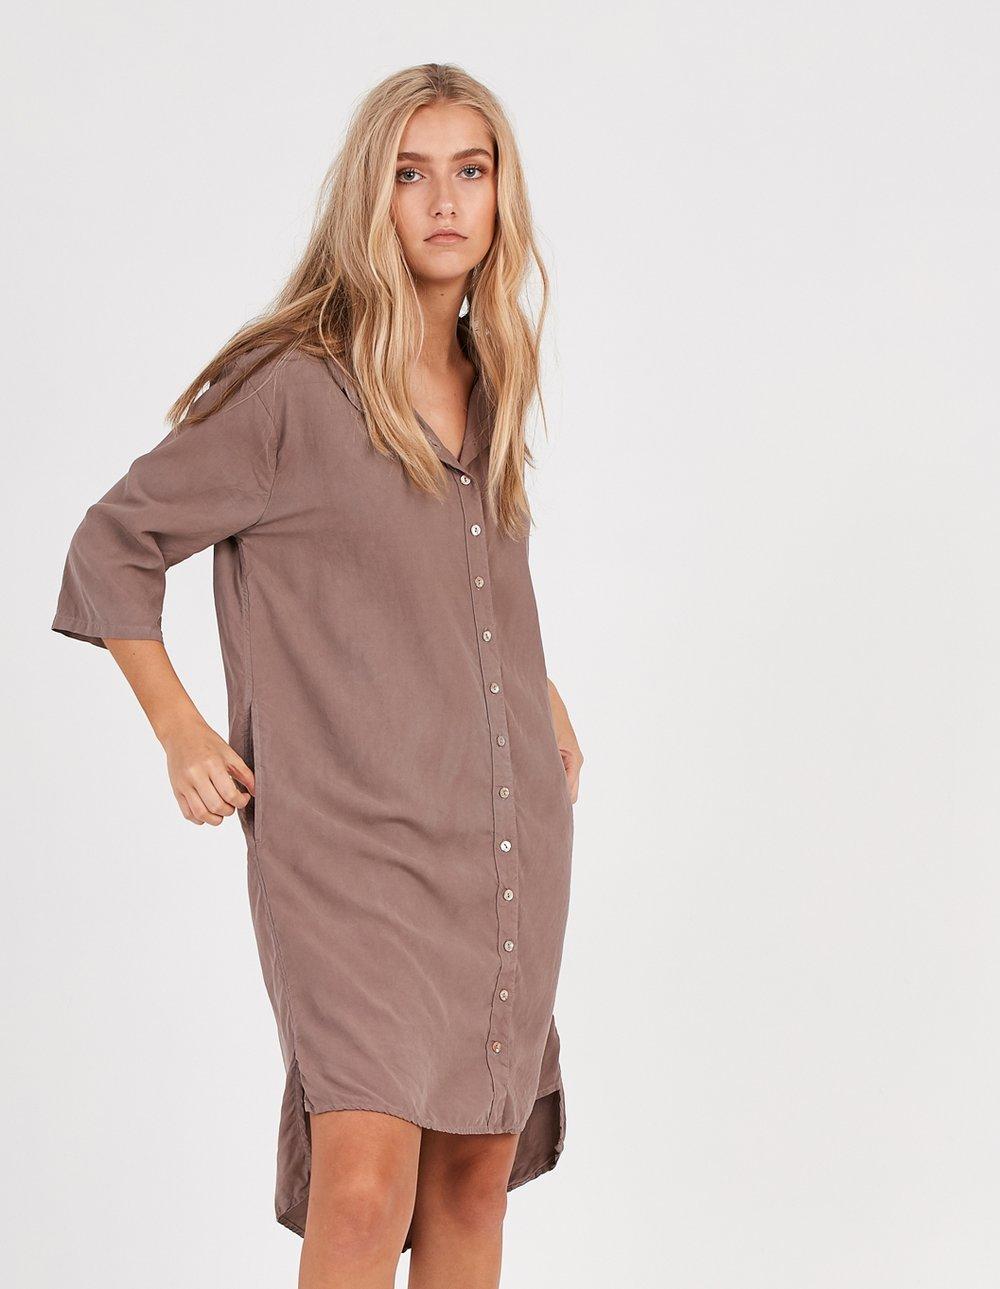 KUL DRESS EXPRESSO BROWN